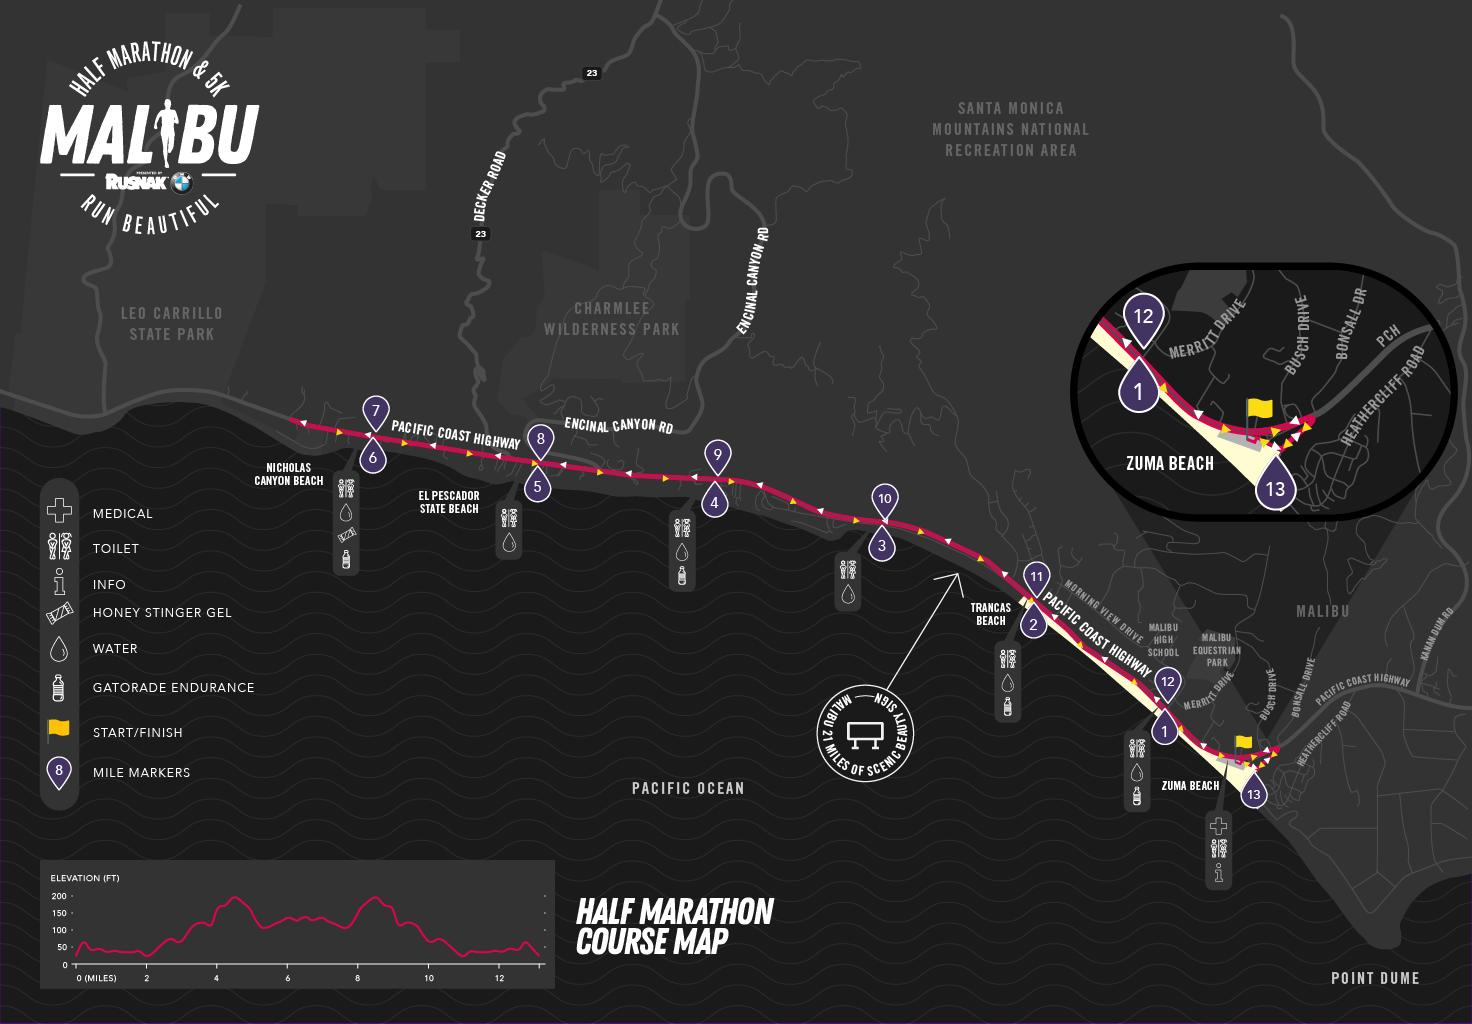 Malibu Half Marathon Course Map